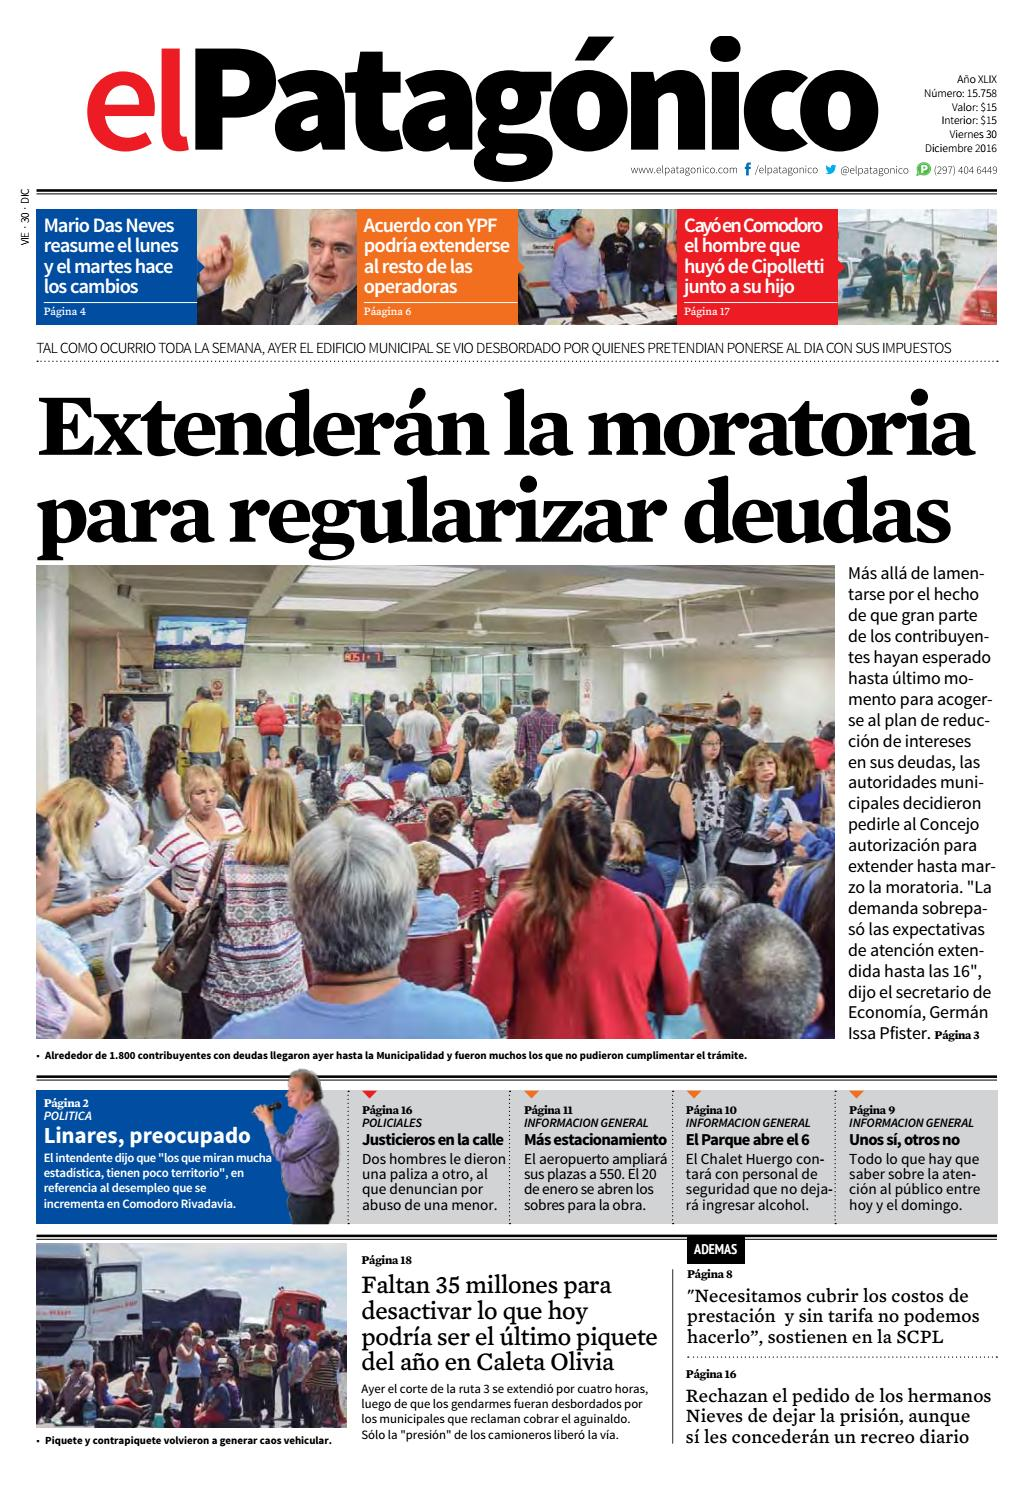 edicion232529122016.pdf by El Patagonico - issuu